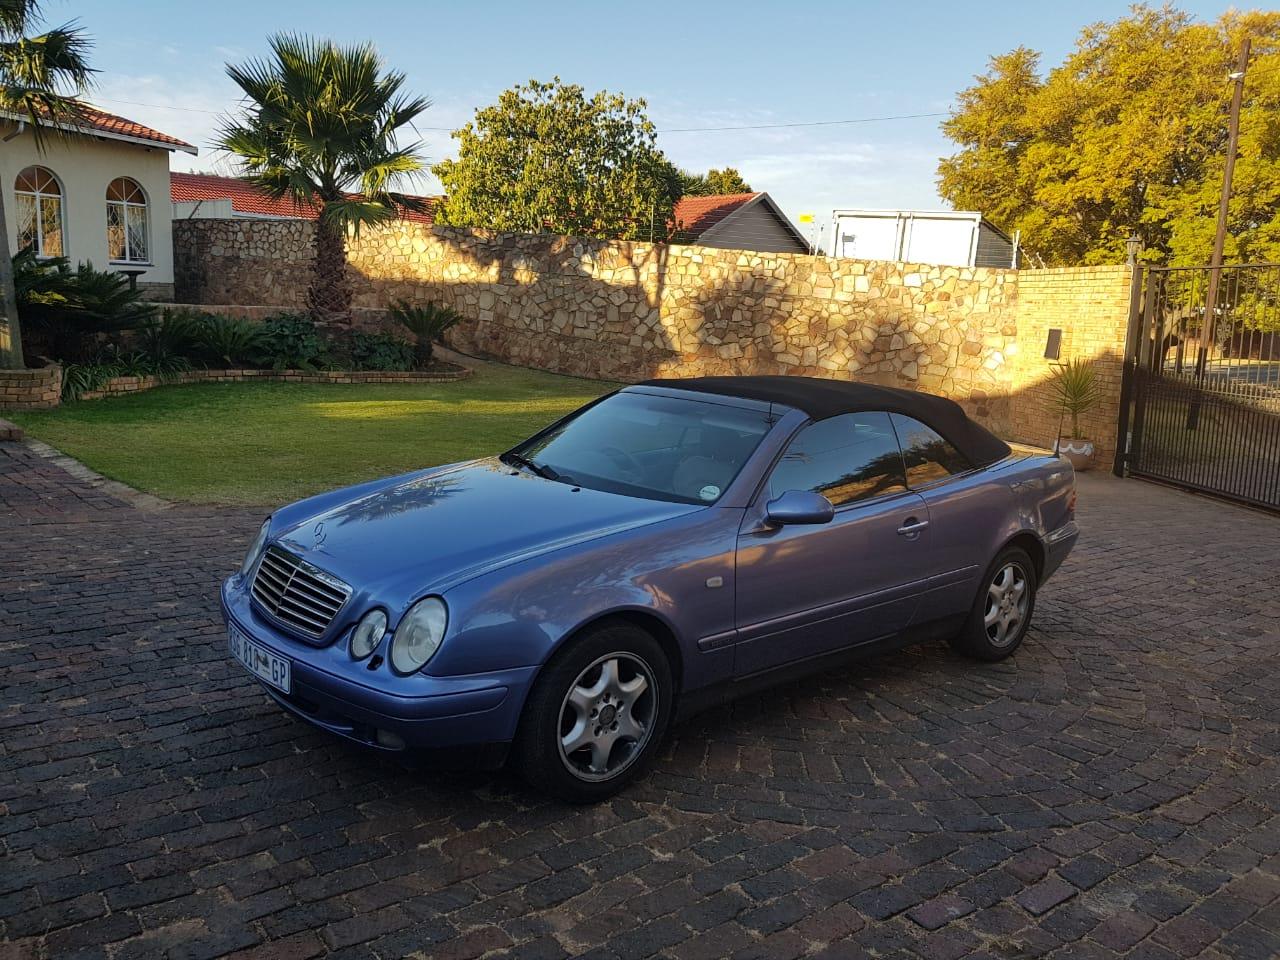 1999 Mercedes Benz CLK 320 Cabriolet Elegance